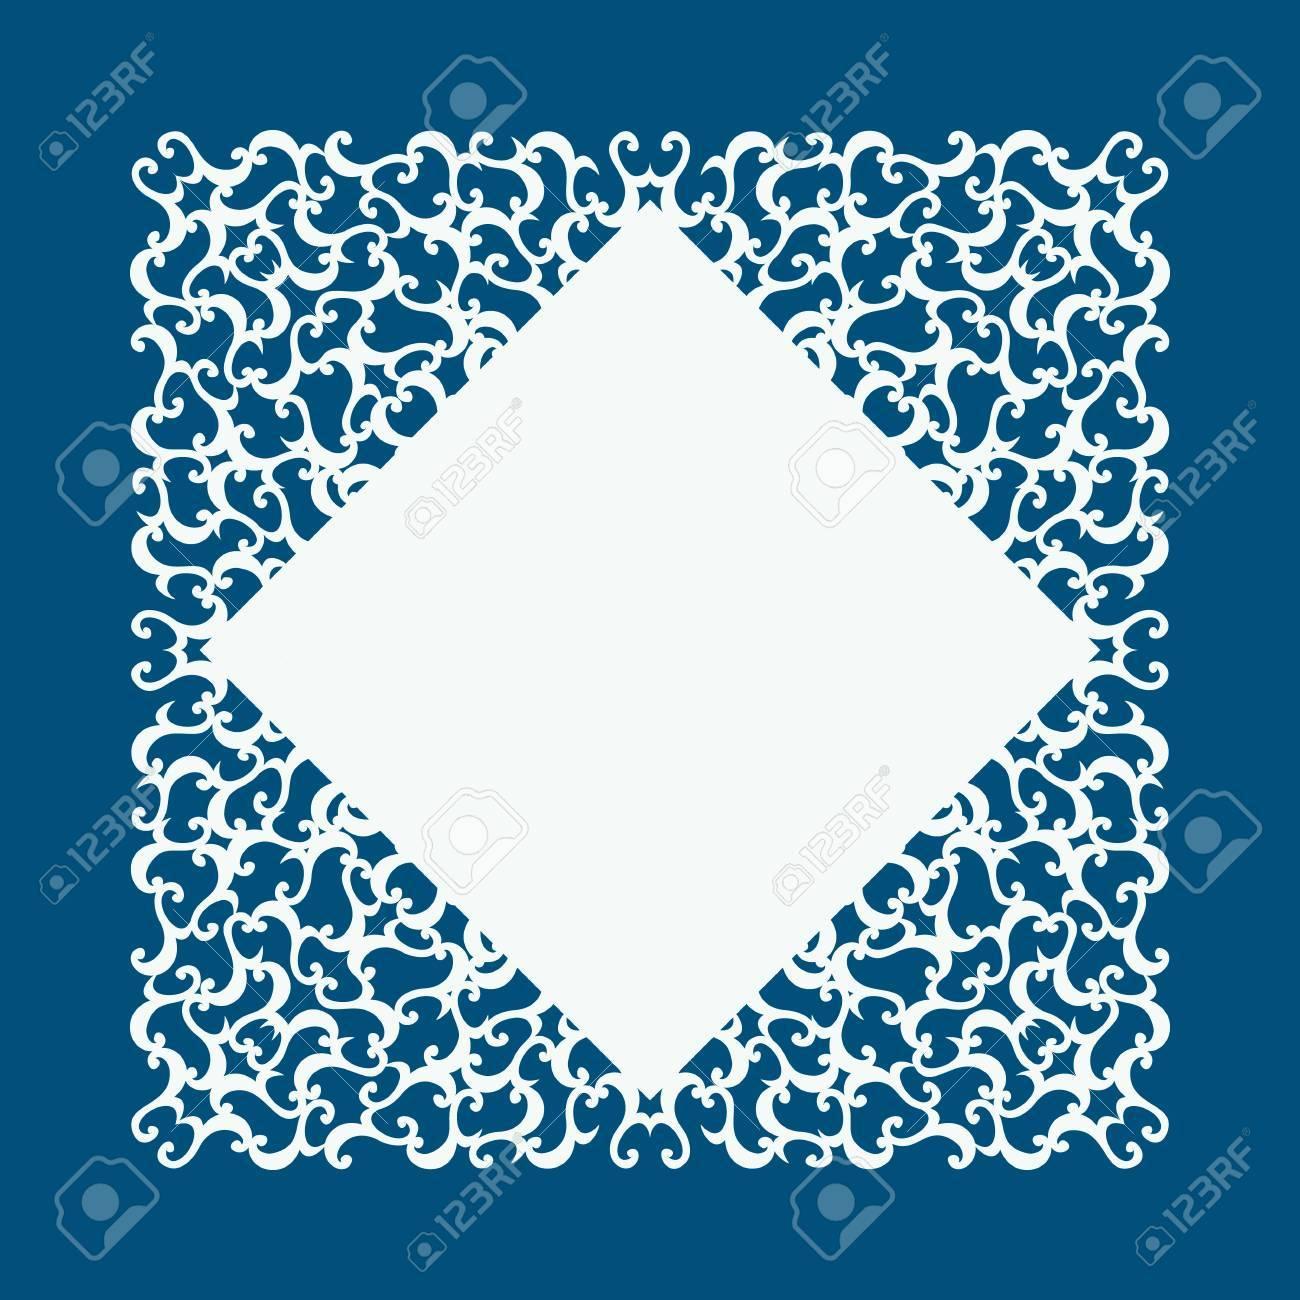 Laser cut card with swirls laser cutting template for diy greeting laser cut card with swirls laser cutting template for diy greeting cards envelopes kristyandbryce Images